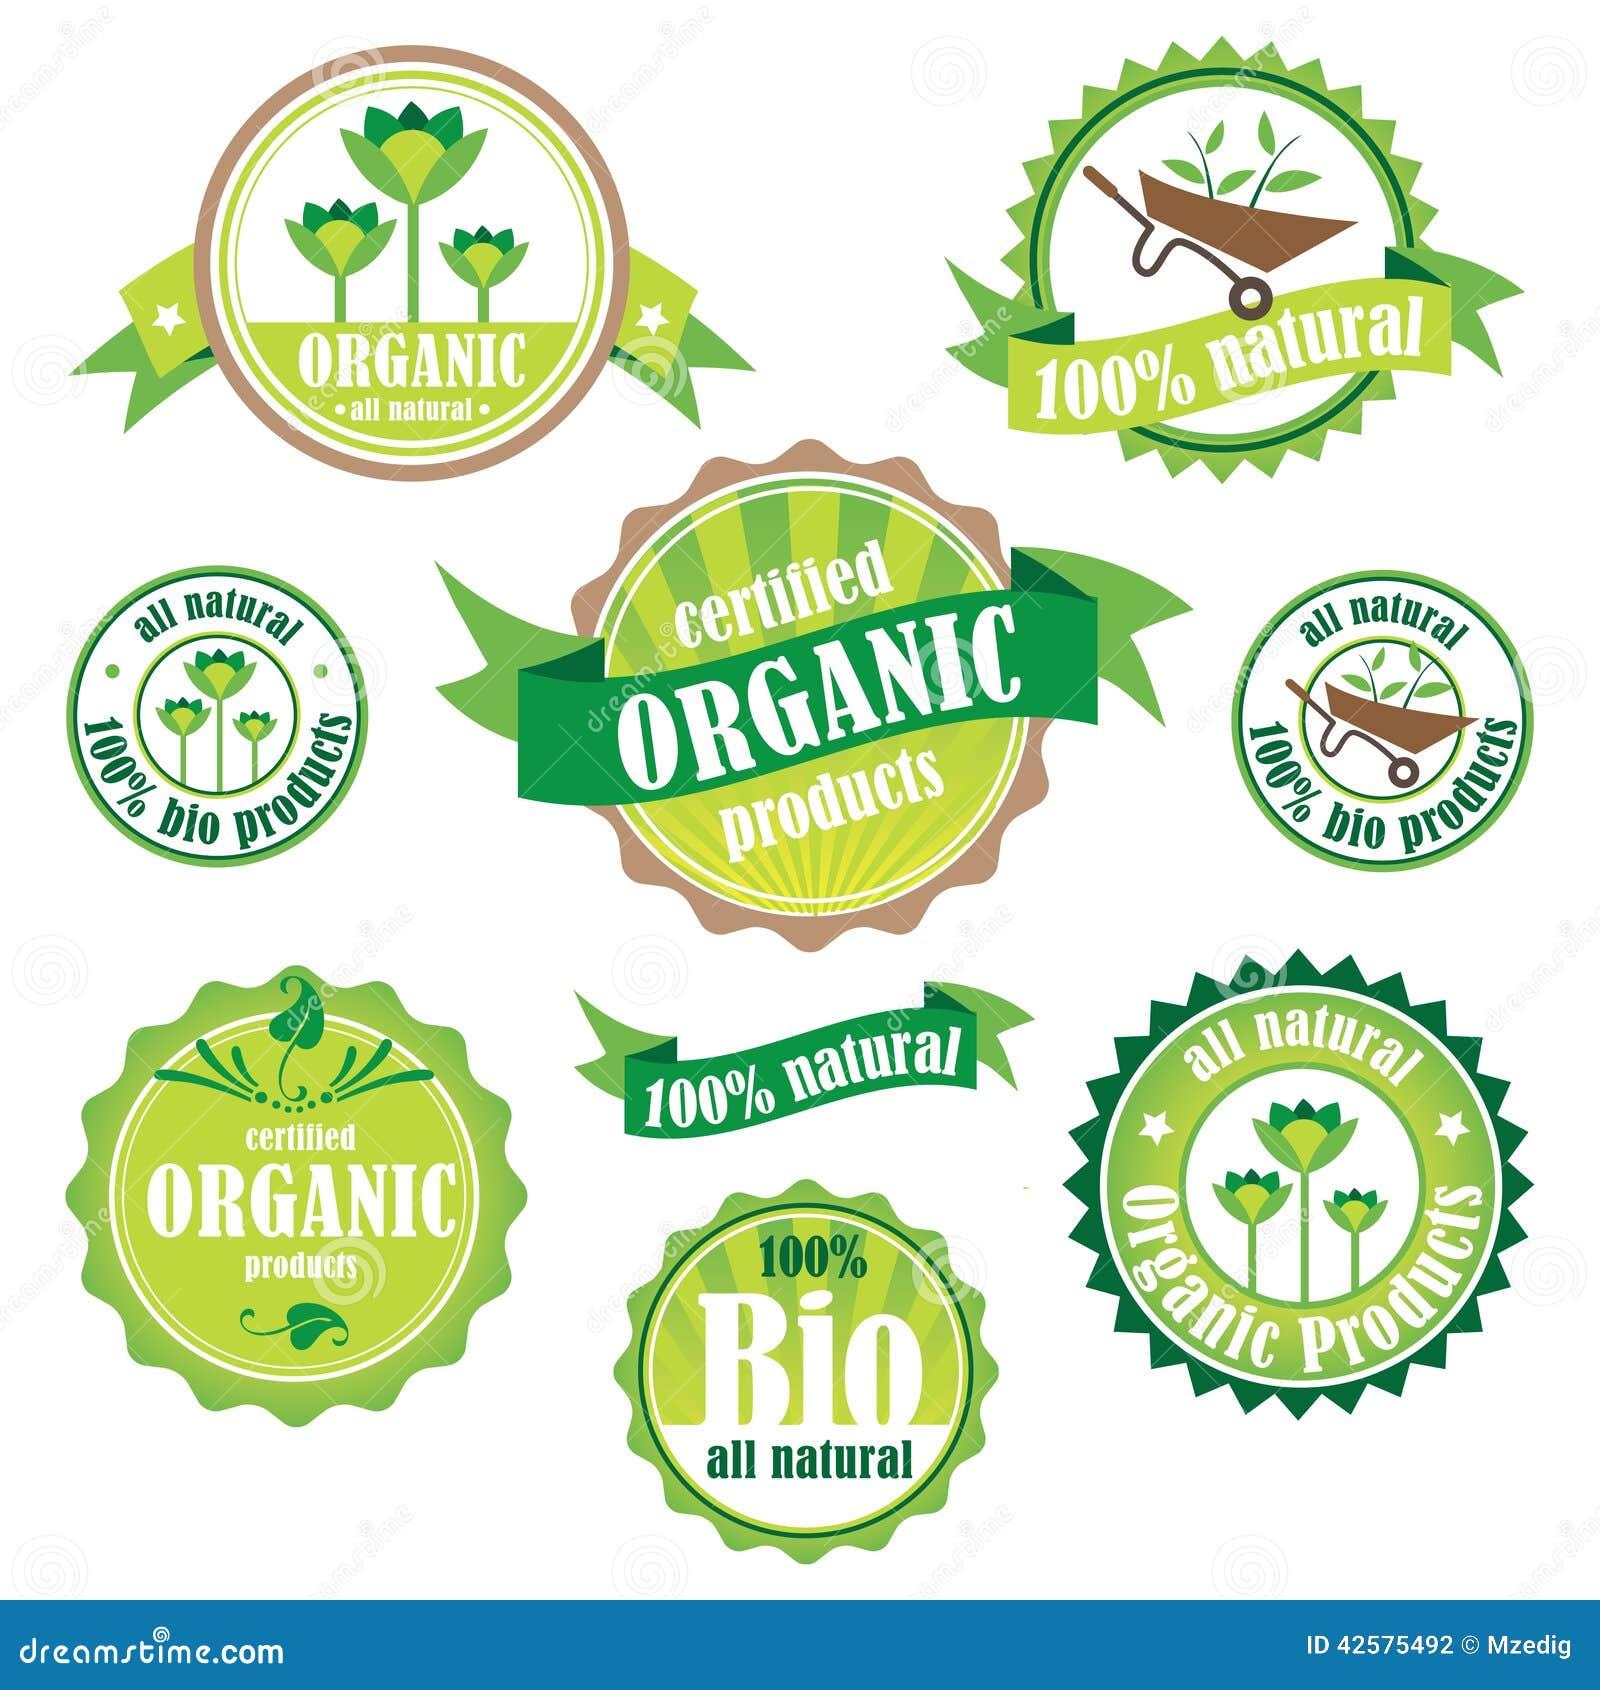 organic natural logos vector illustration